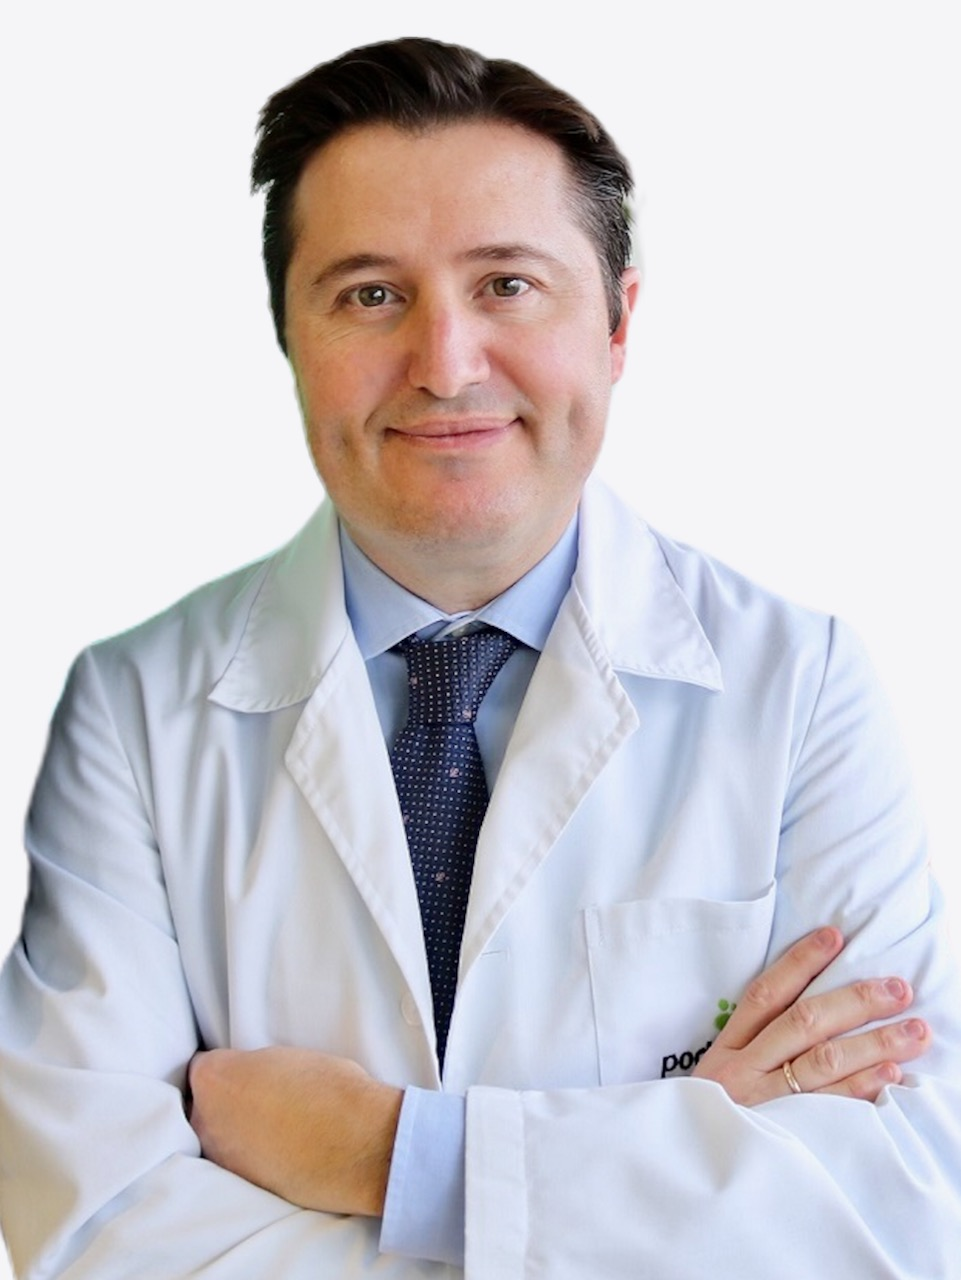 José Víctor Alfaro Santafé